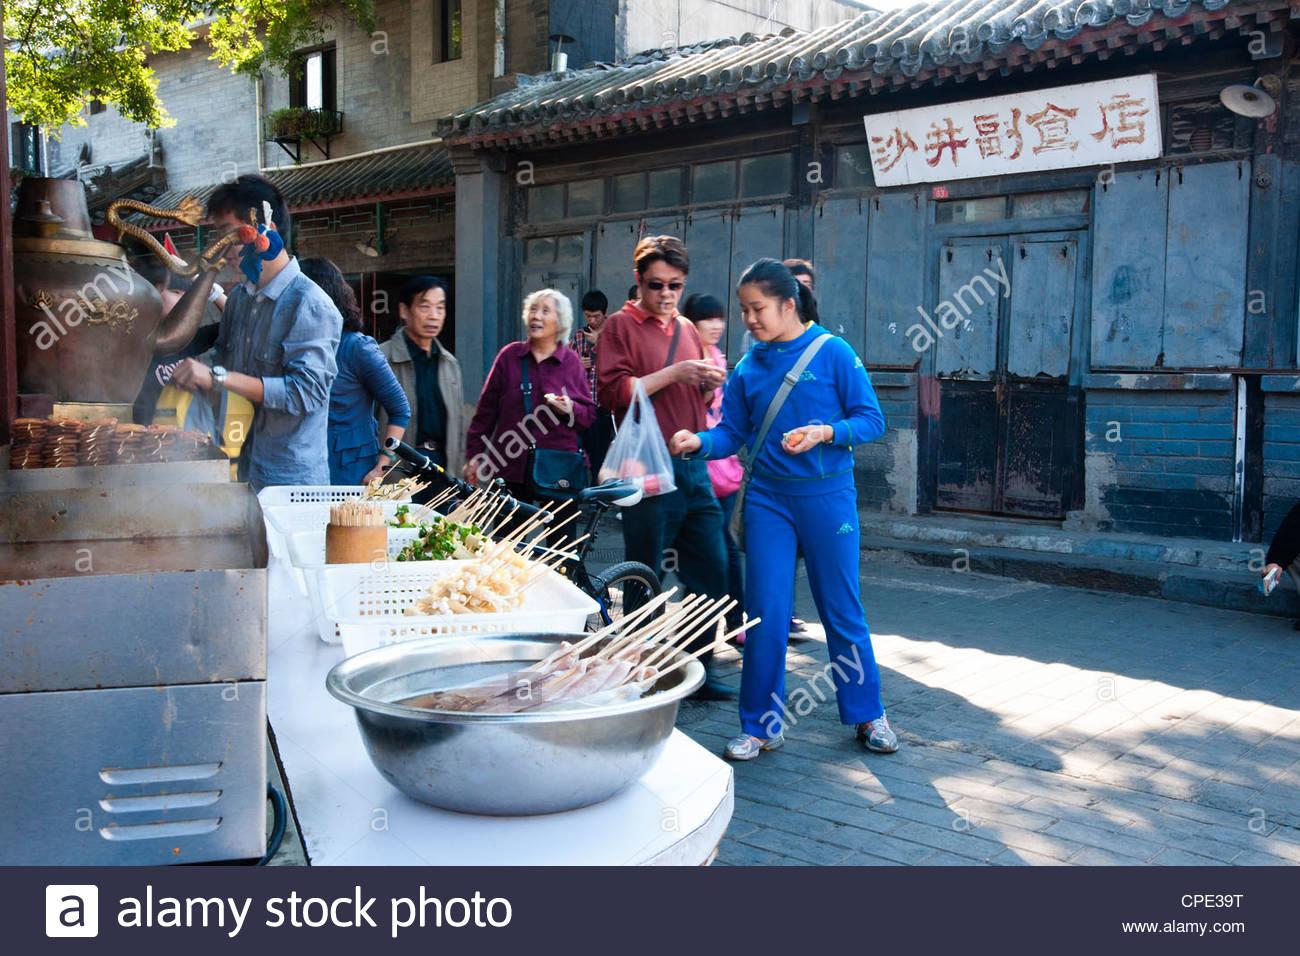 Houhai Hutong neighborhood, Beijing, China, Asia - Stock Image